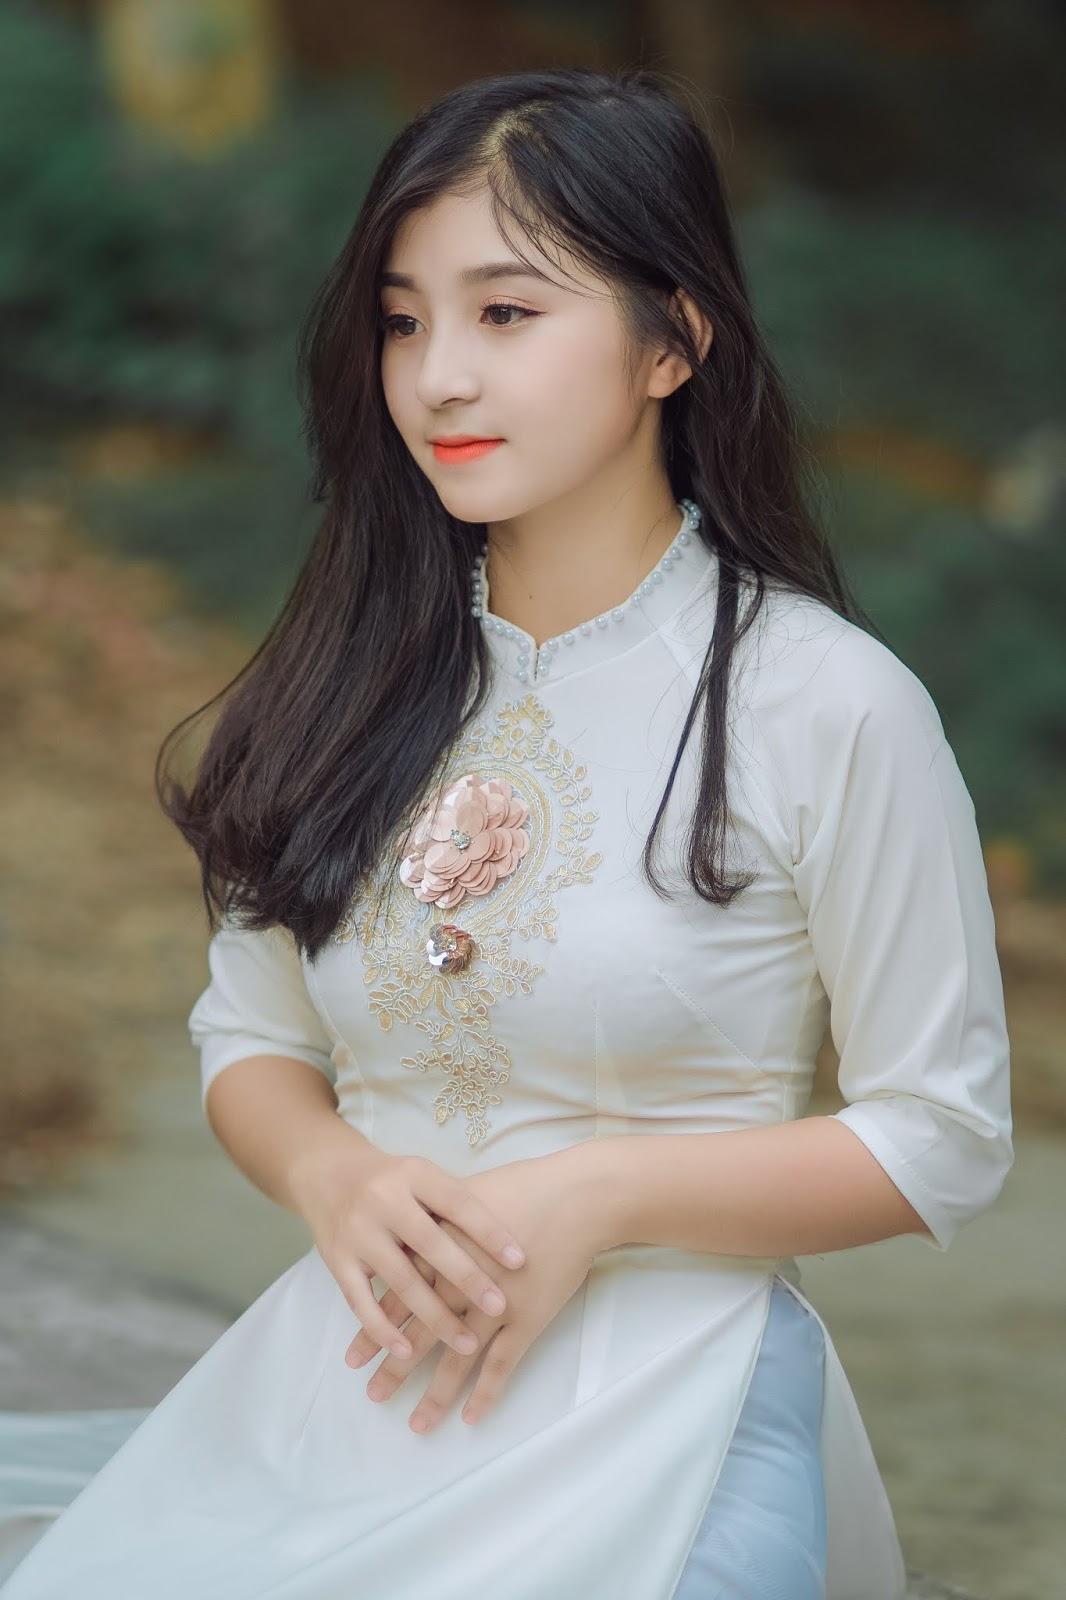 Cute Love Pics 2019